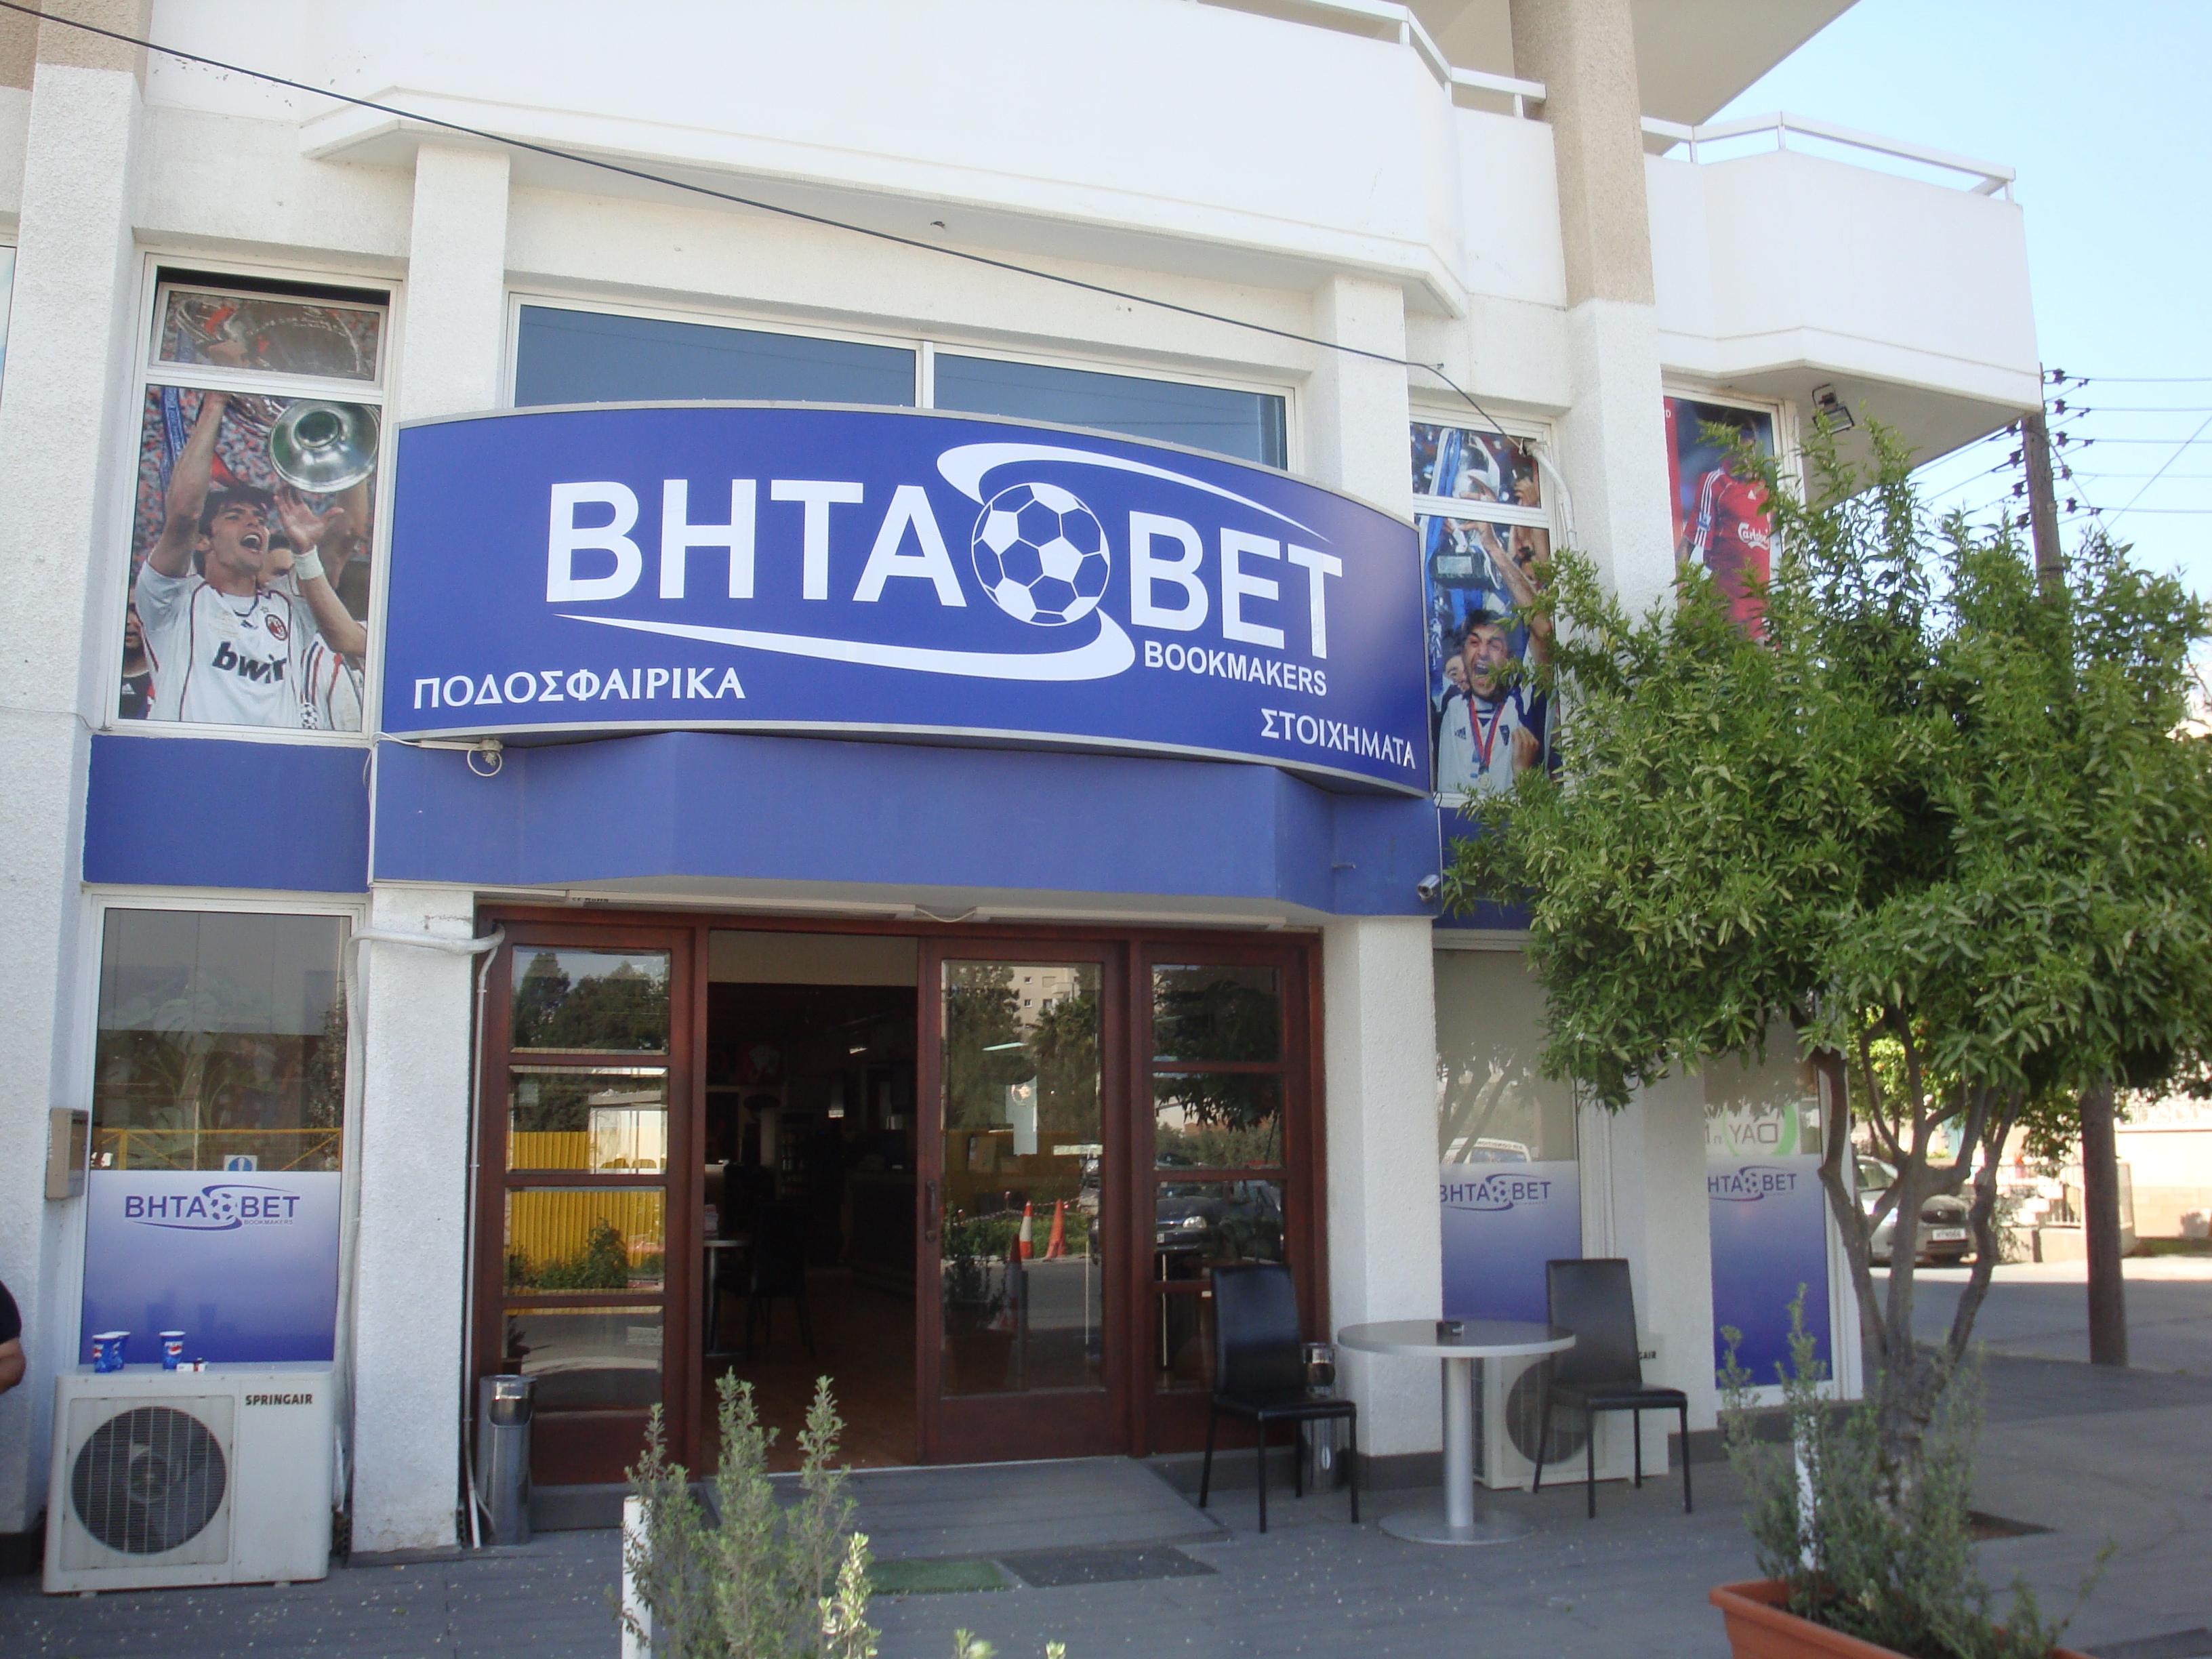 Bhtabet nicosia betting football betting spreadsheet